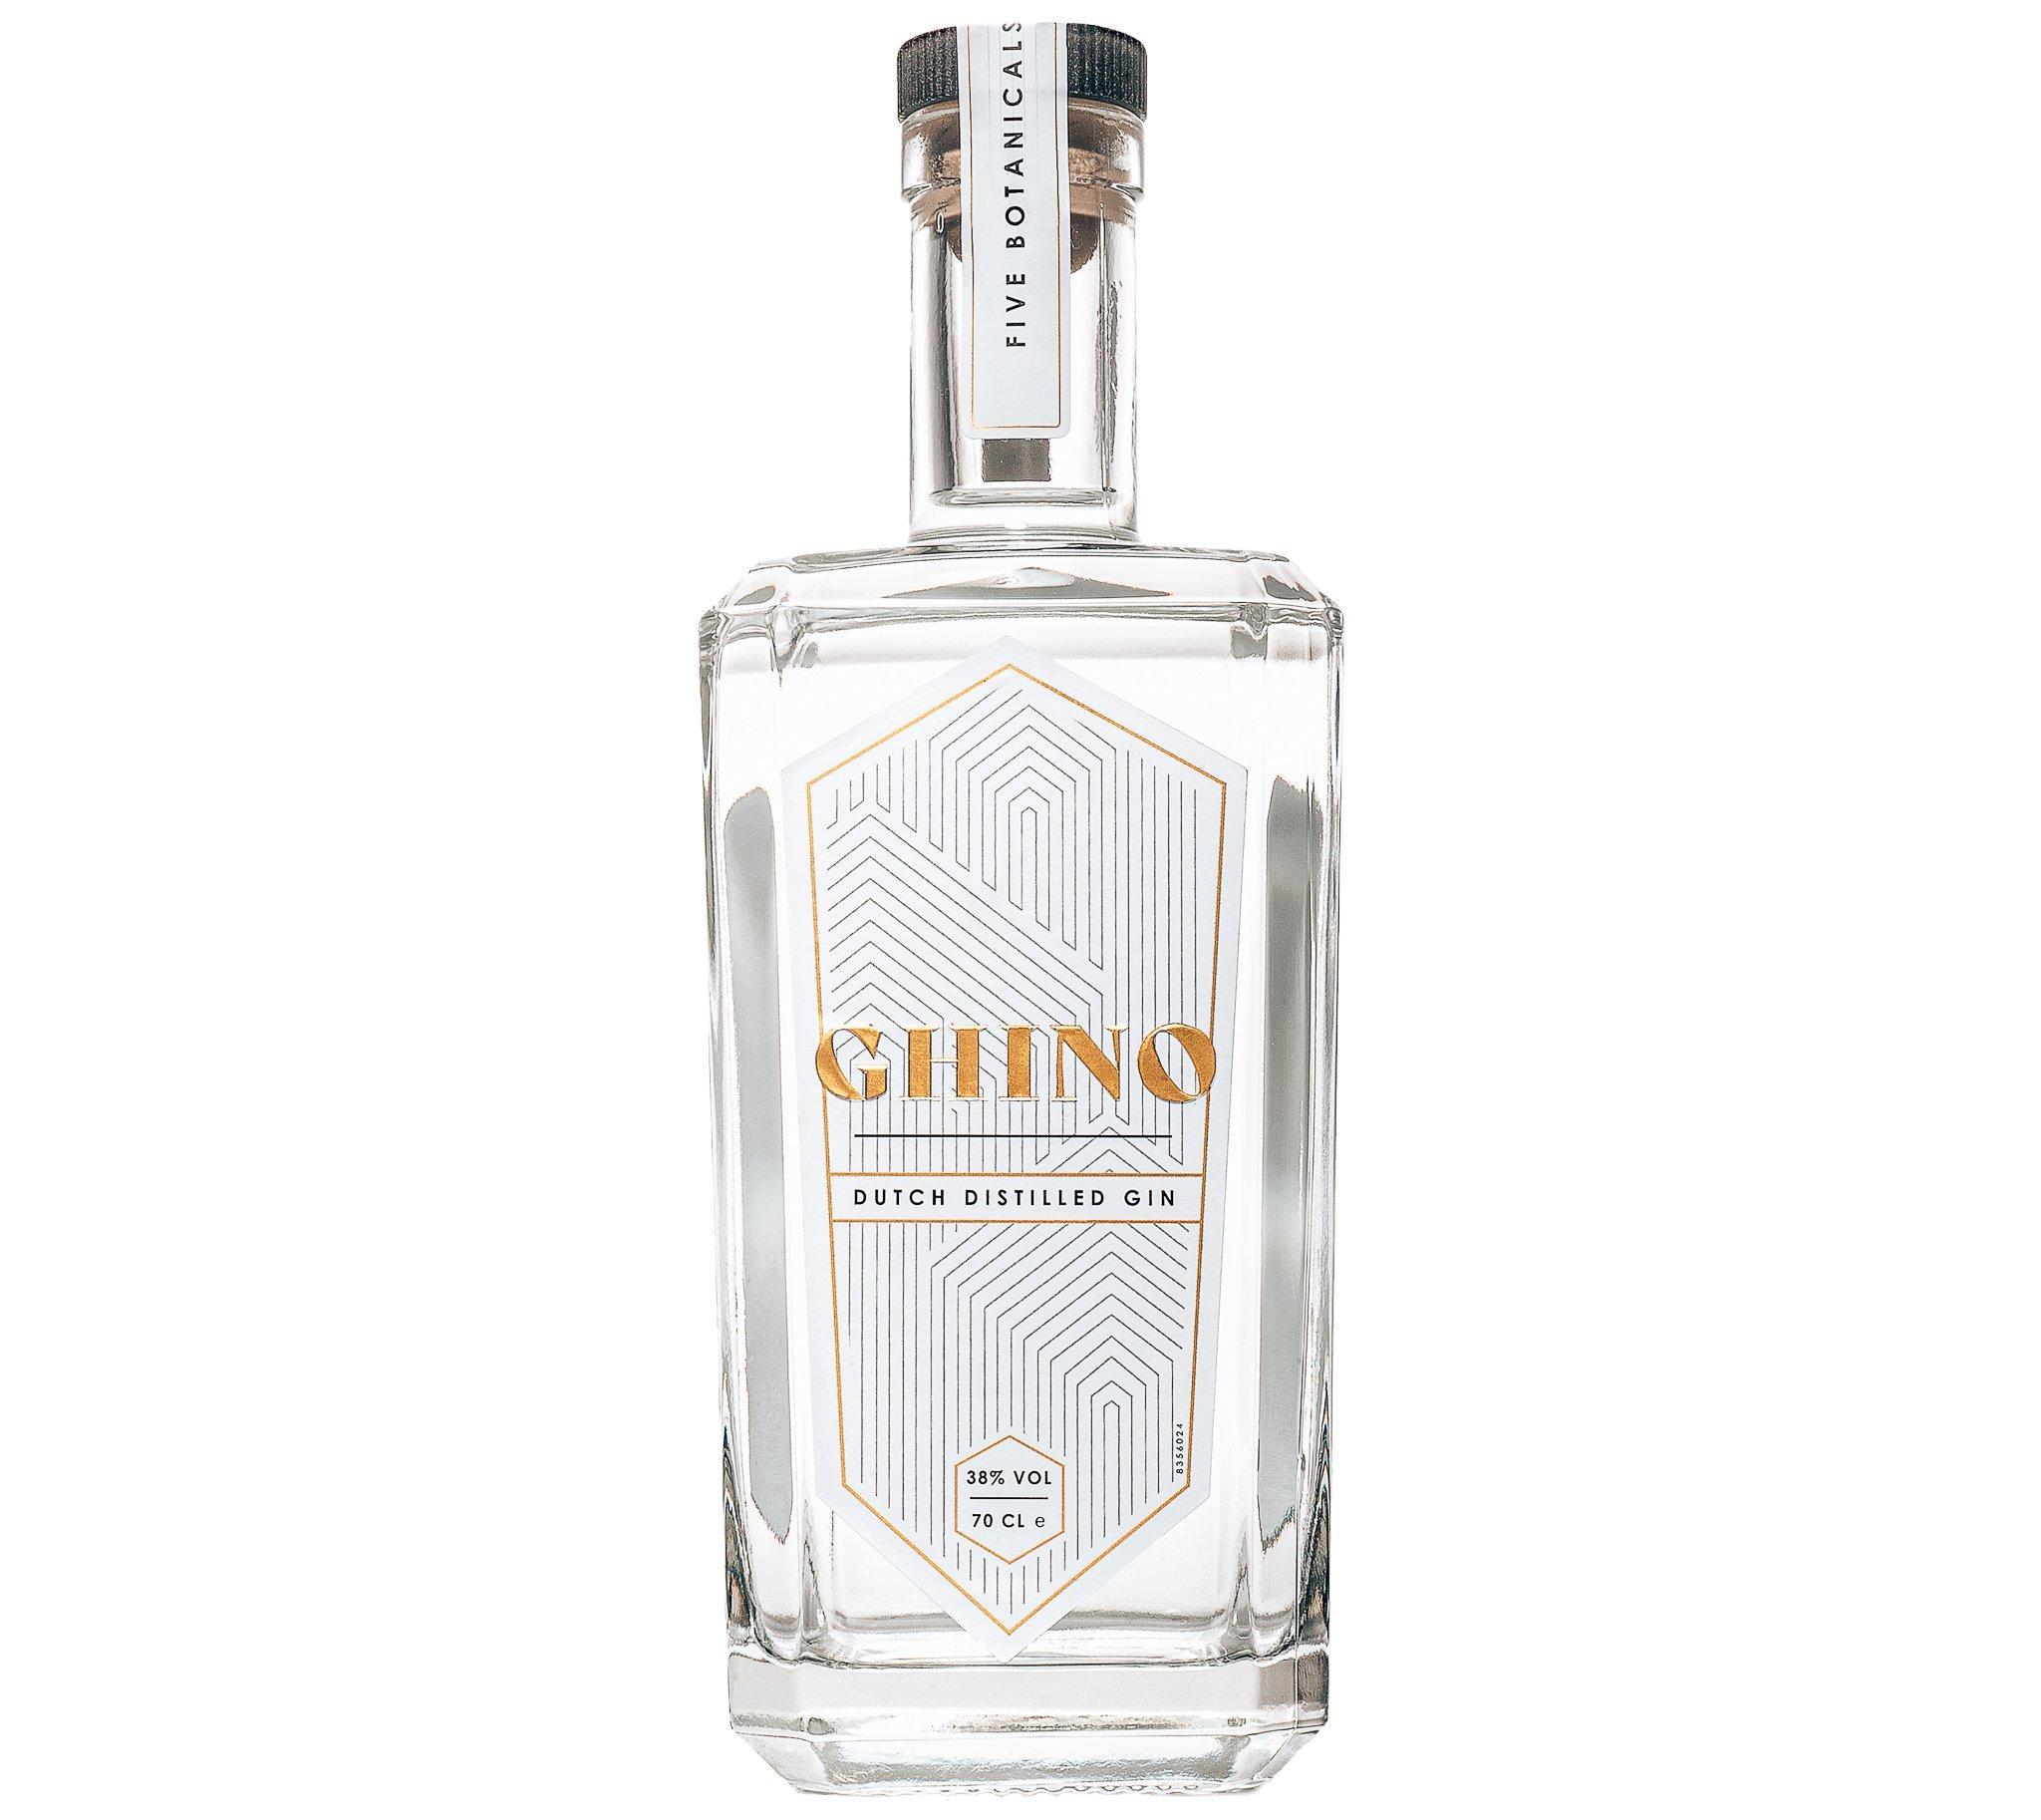 Gin fles van Ghino Gin, Alles over gin.